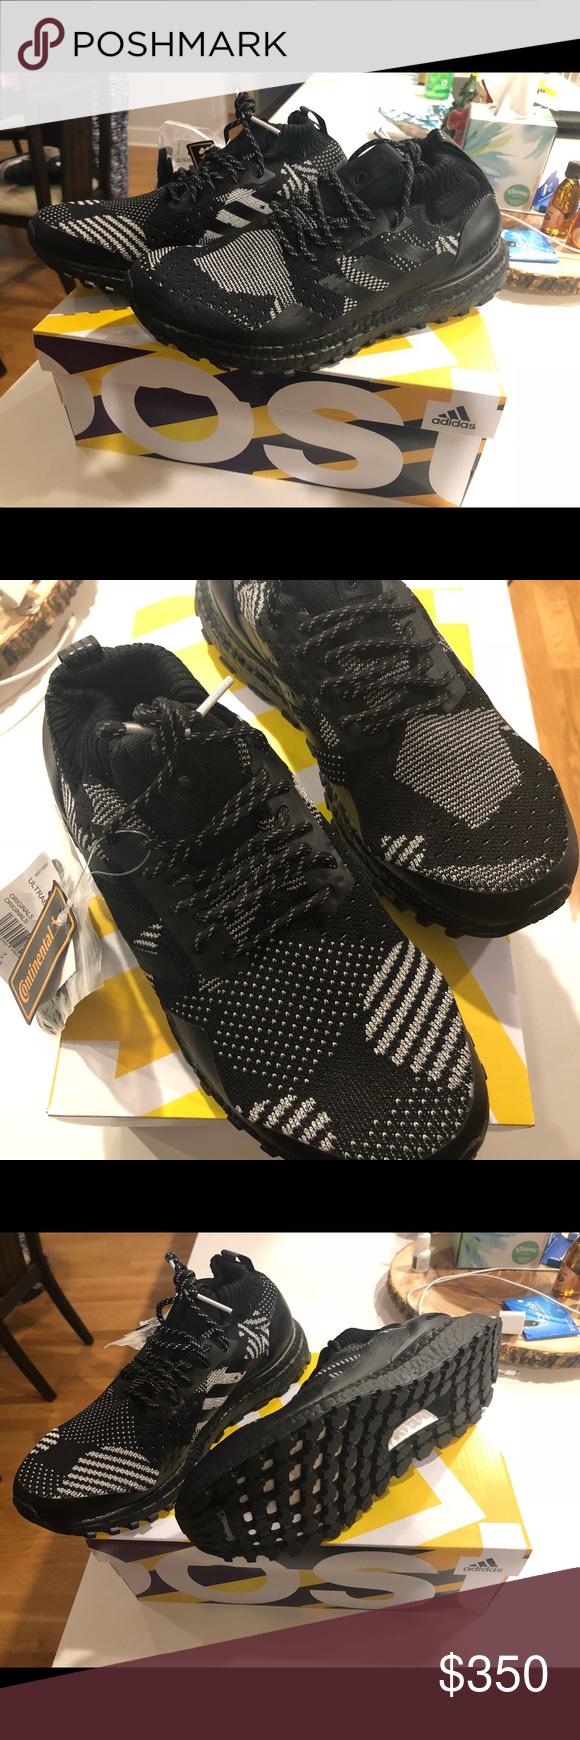 online retailer 44fbc 793d4 adidas Shoes | Kith X Nonnative X Adidas Ultraboost Mid Atr ...